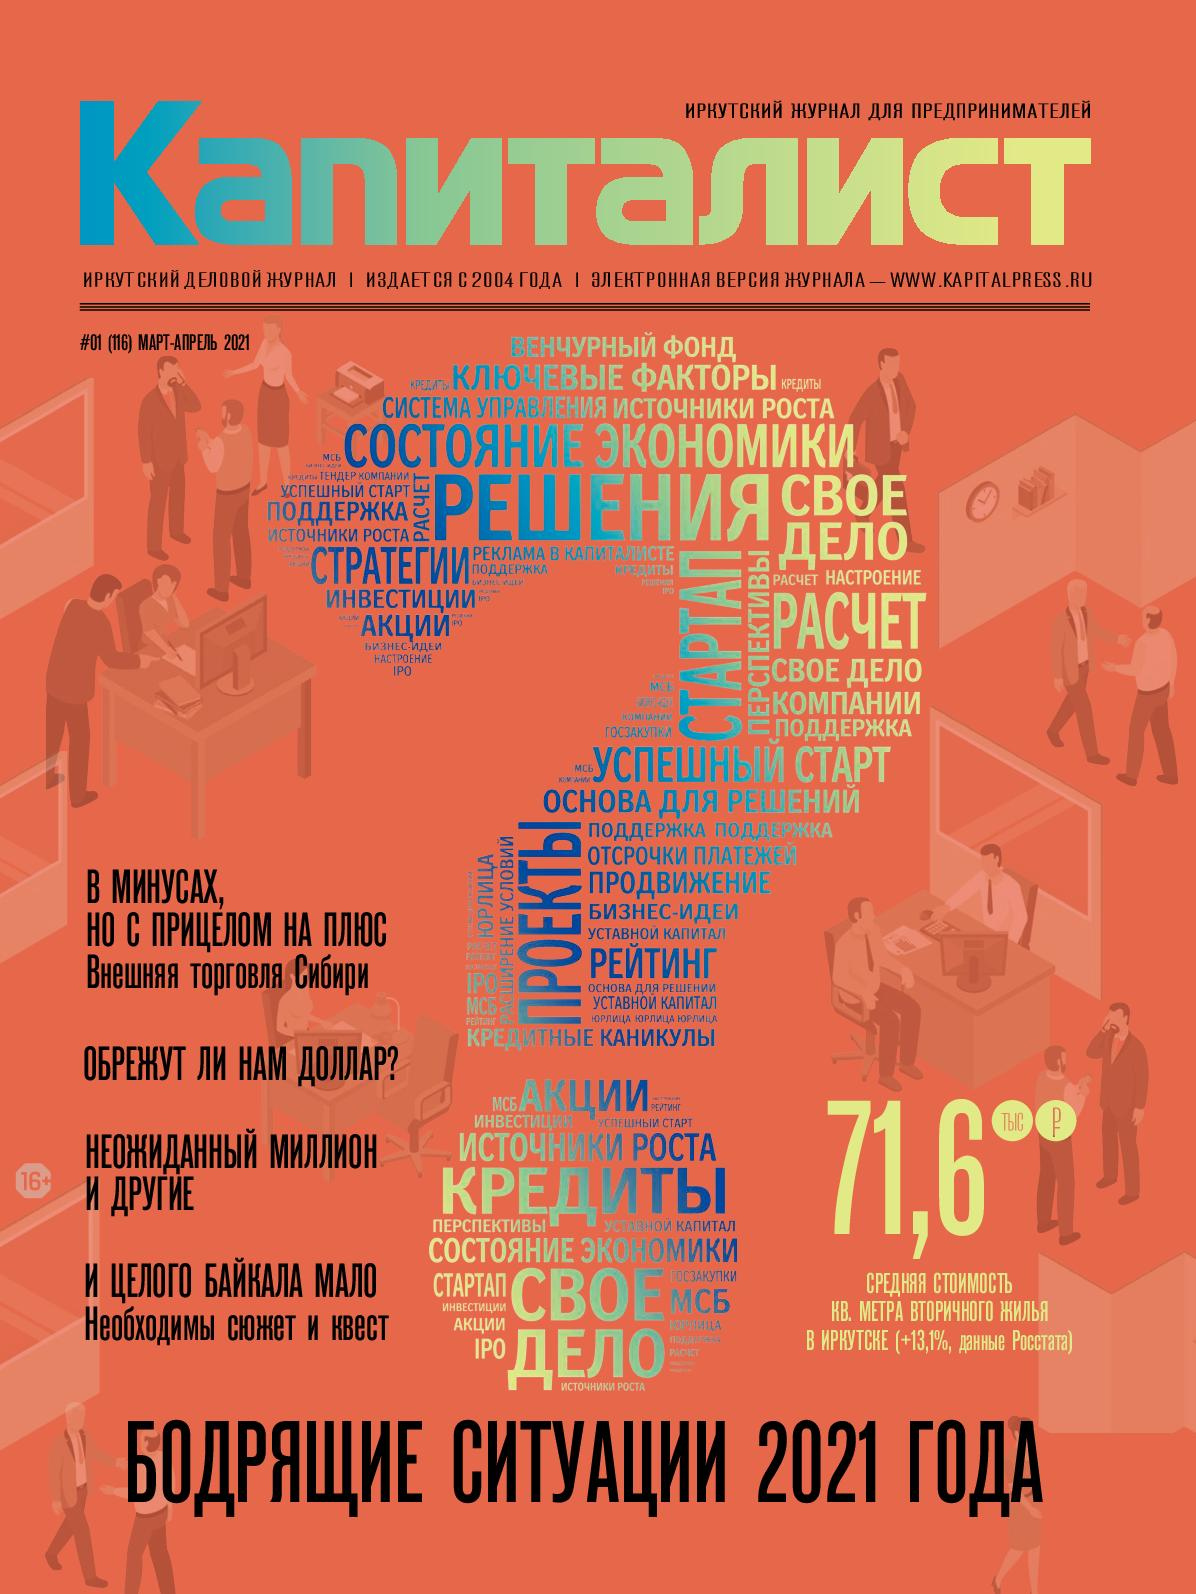 Журнал Капиталист №01 (106) ФЕВРАЛЬ-МАРТ 2019